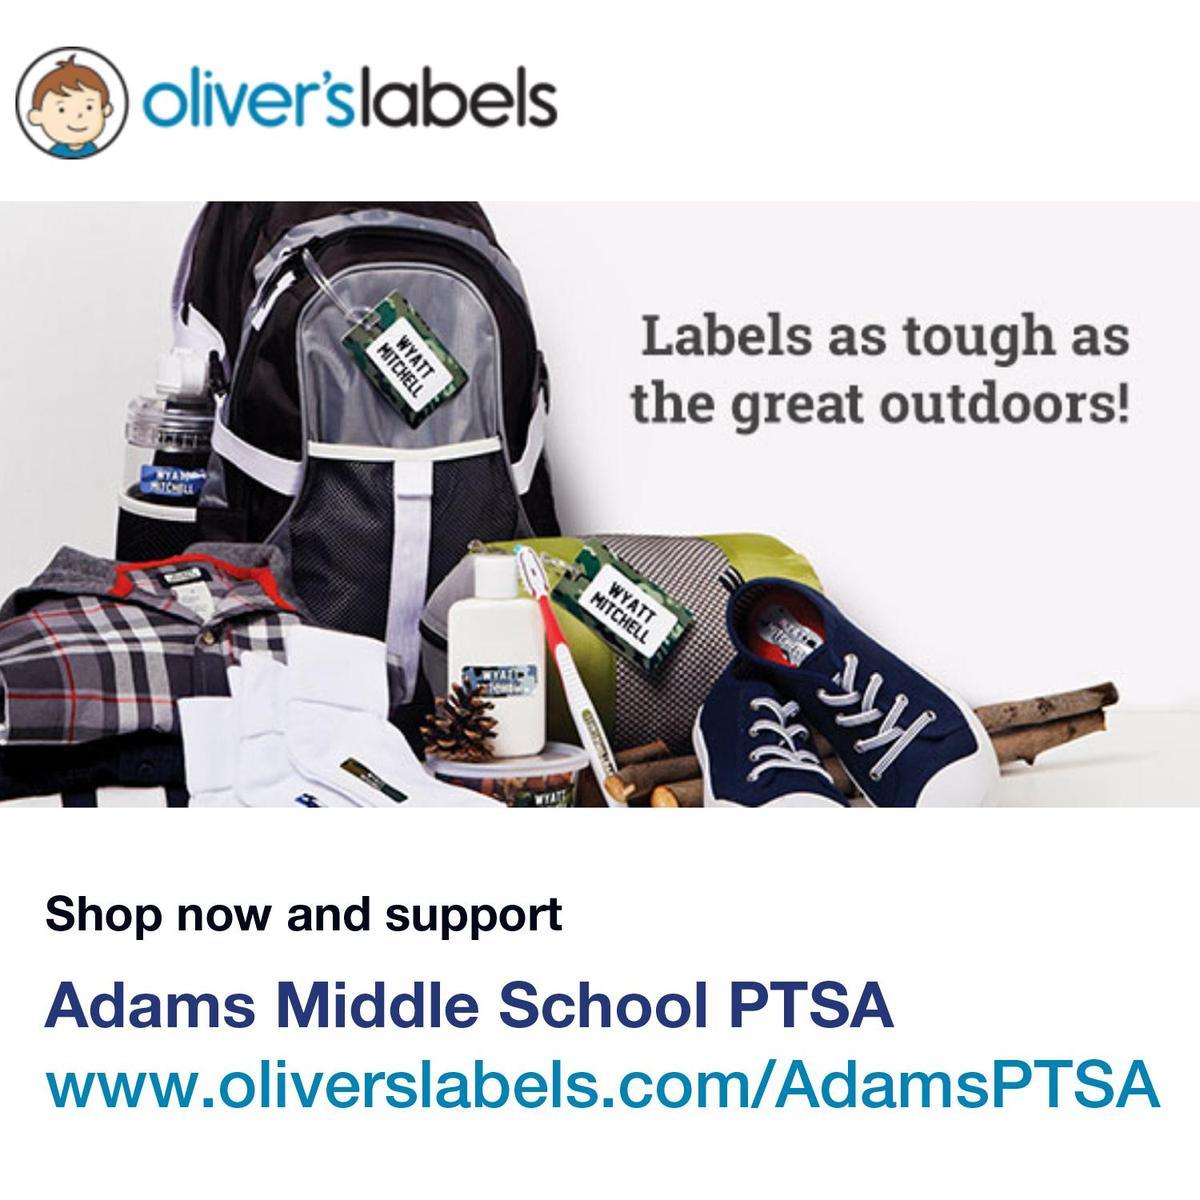 www.oliverslabels.com/AdamsPTSA